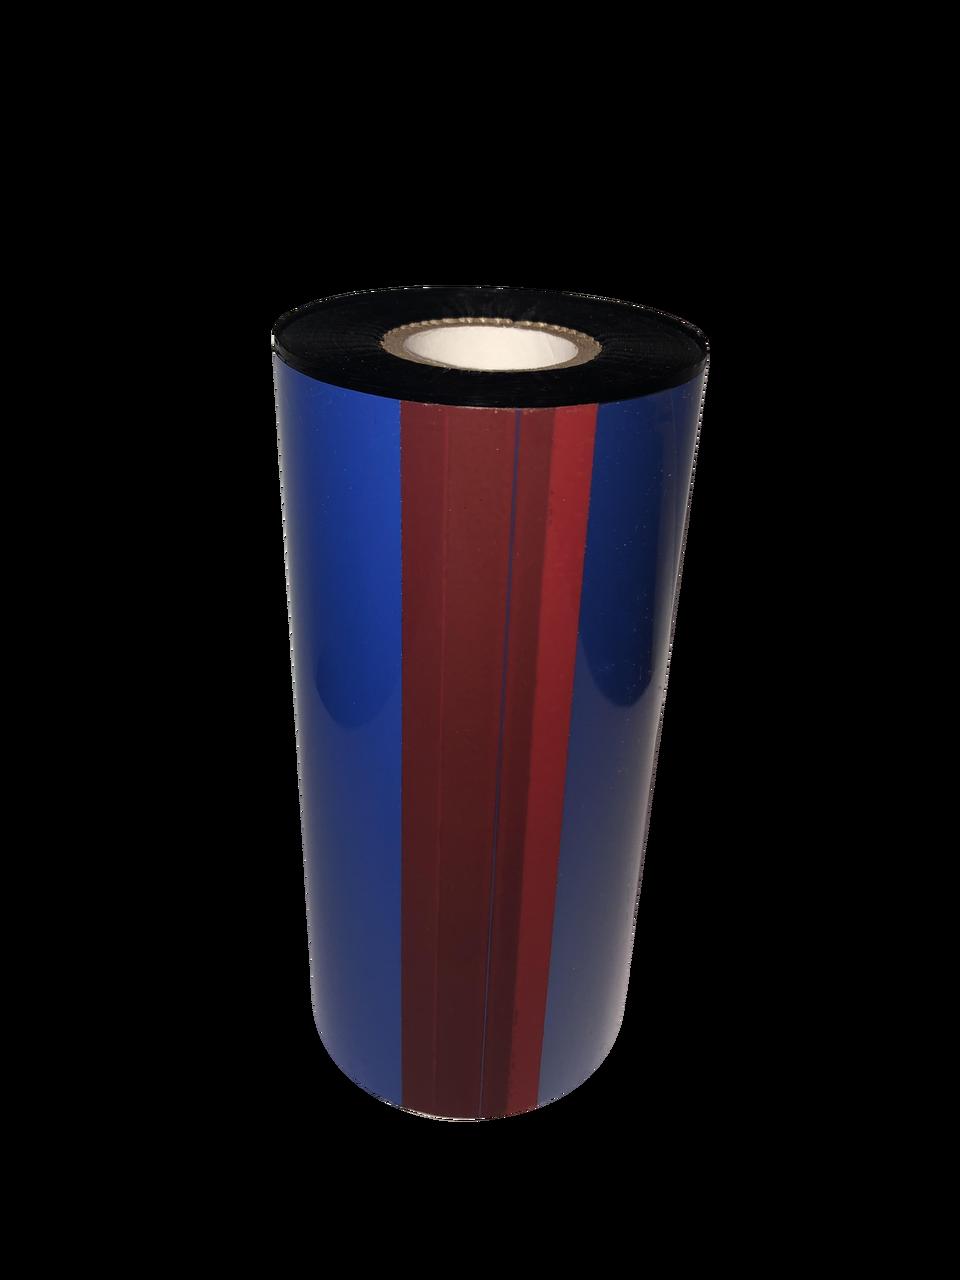 "Auto-P PI-4000 3.5""x2001 ft TR4085plus Resin Enhanced Wax-24/Ctn thermal transfer ribbon"